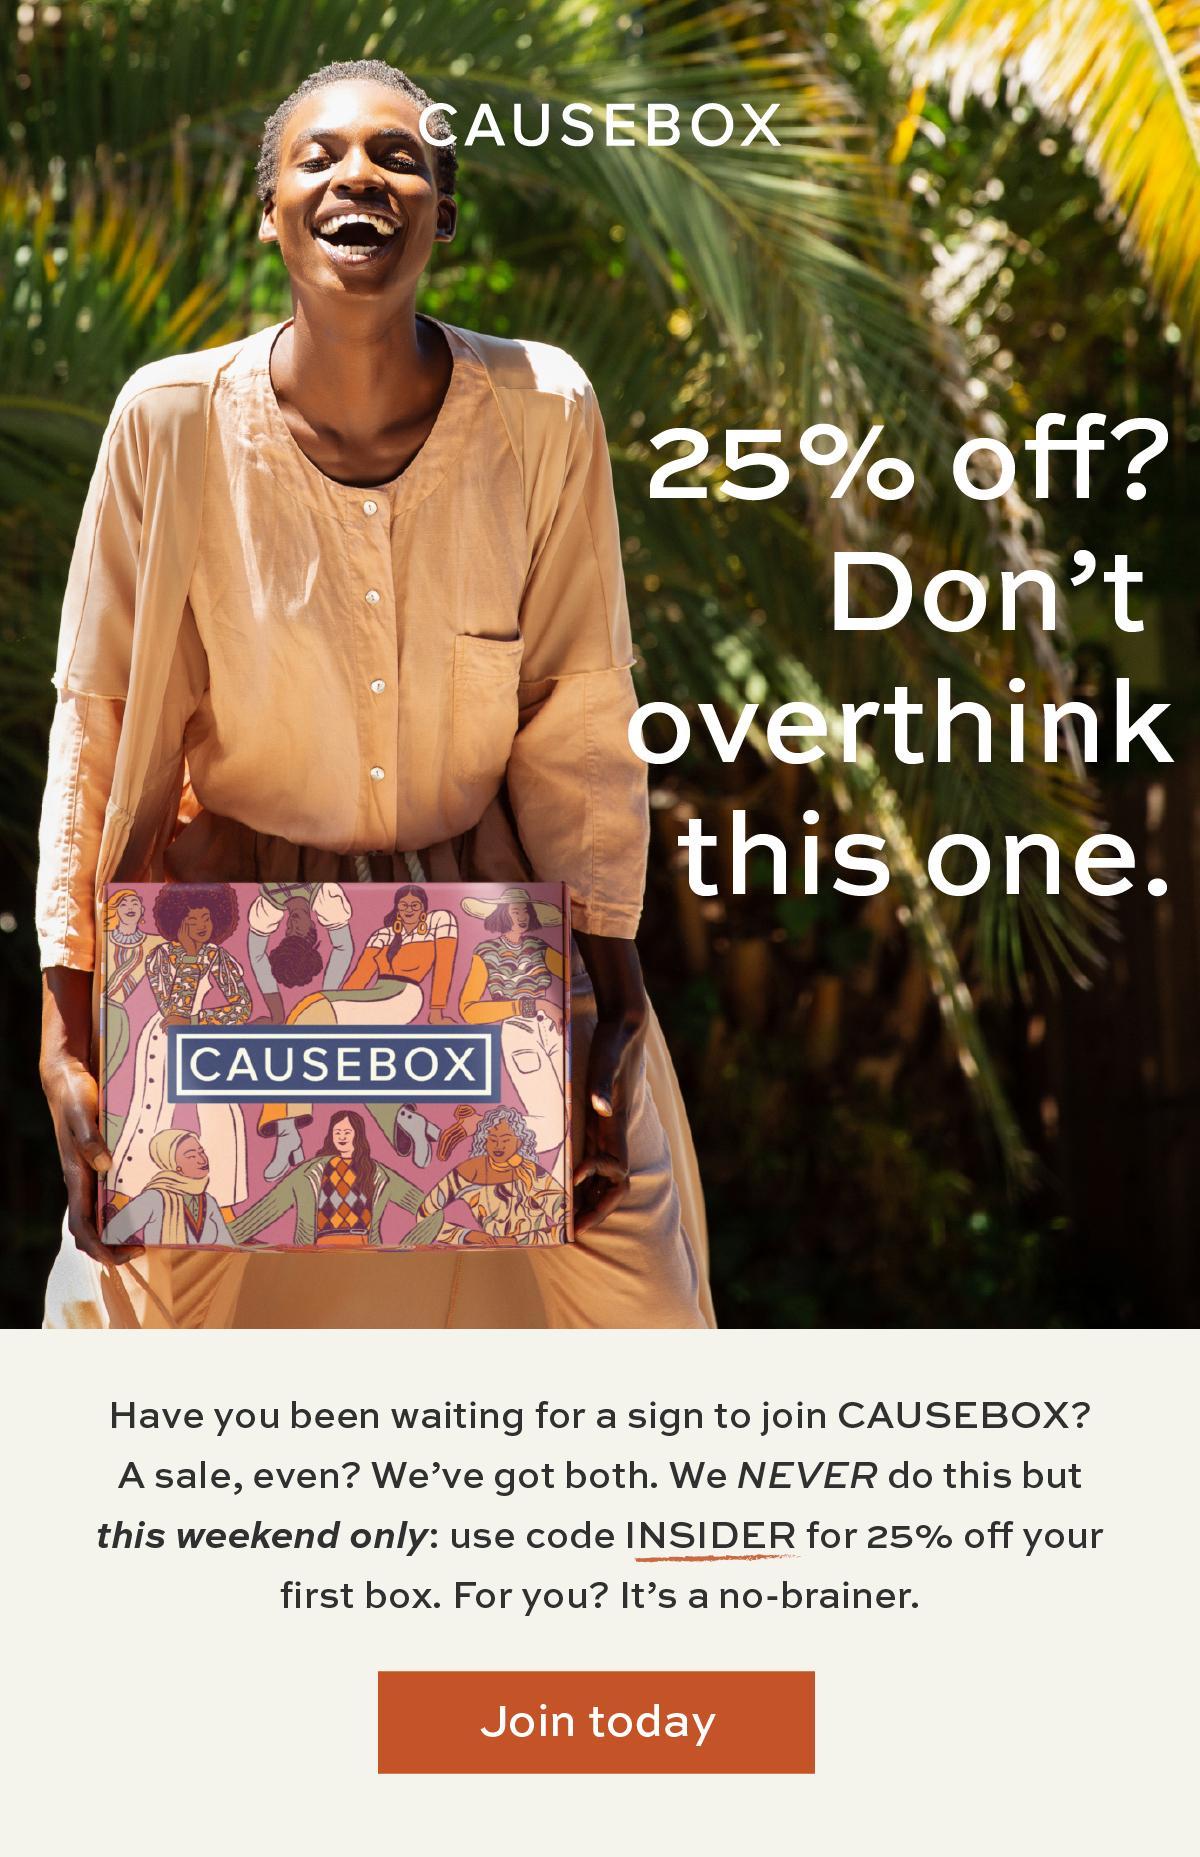 CAUSEBOX Fall 2020 Welcome Box Coupon Code – Save 25%!